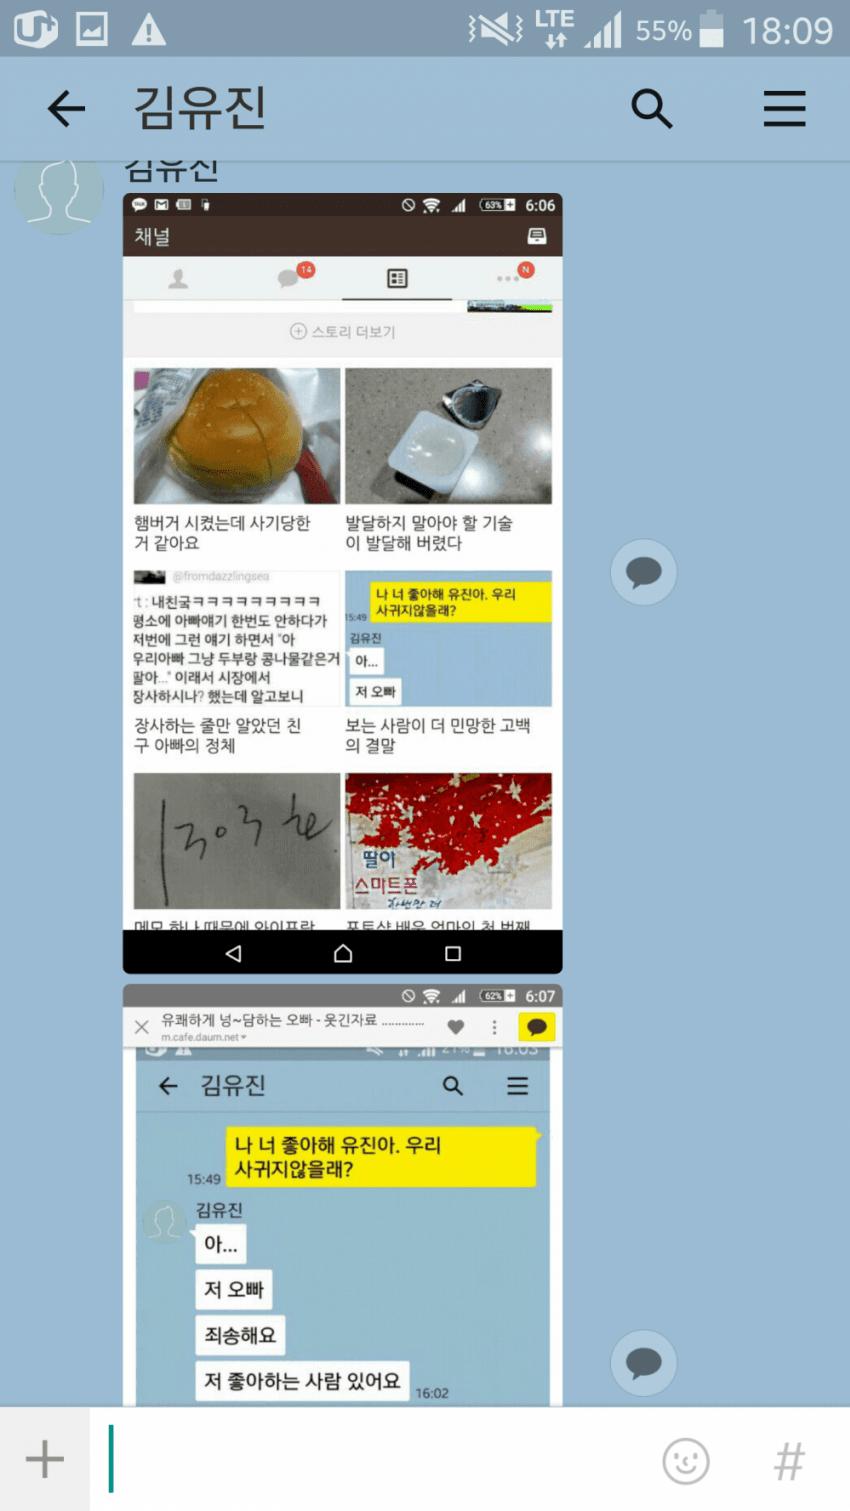 viewimage.php?id=3eb4de21e9d73ab360b8dab04785736f&no=24b0d769e1d32ca73deb86fa11d02831d16706cea37200d6da9182798677dc63e3c2605a98ffa92dce0ee007ba82d5a8d7a8acb7ae5fb3d6c4edc92f464bcf08f79f8f8a95f814f17ec4e681c00ced7761bdb9e0d6a2bdd89300bbb109b1ce8e251ab9671bc4916b4a363724d654e51d